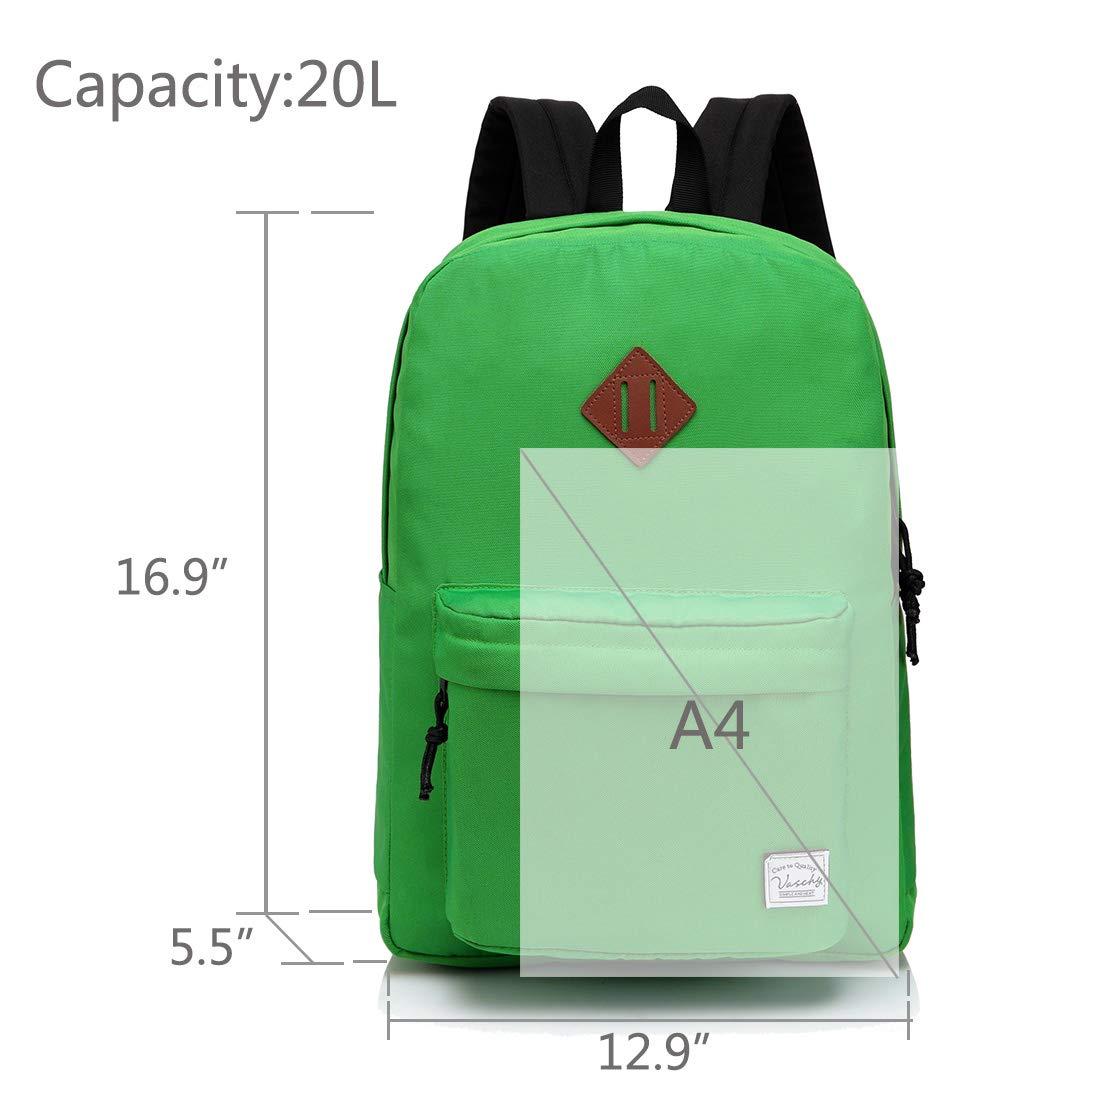 KIDS TEENS BACKPACK LIGHTWEIGHT SCHOOL BAG WATER RESISTANT BOTTLE SIDE POCKETS